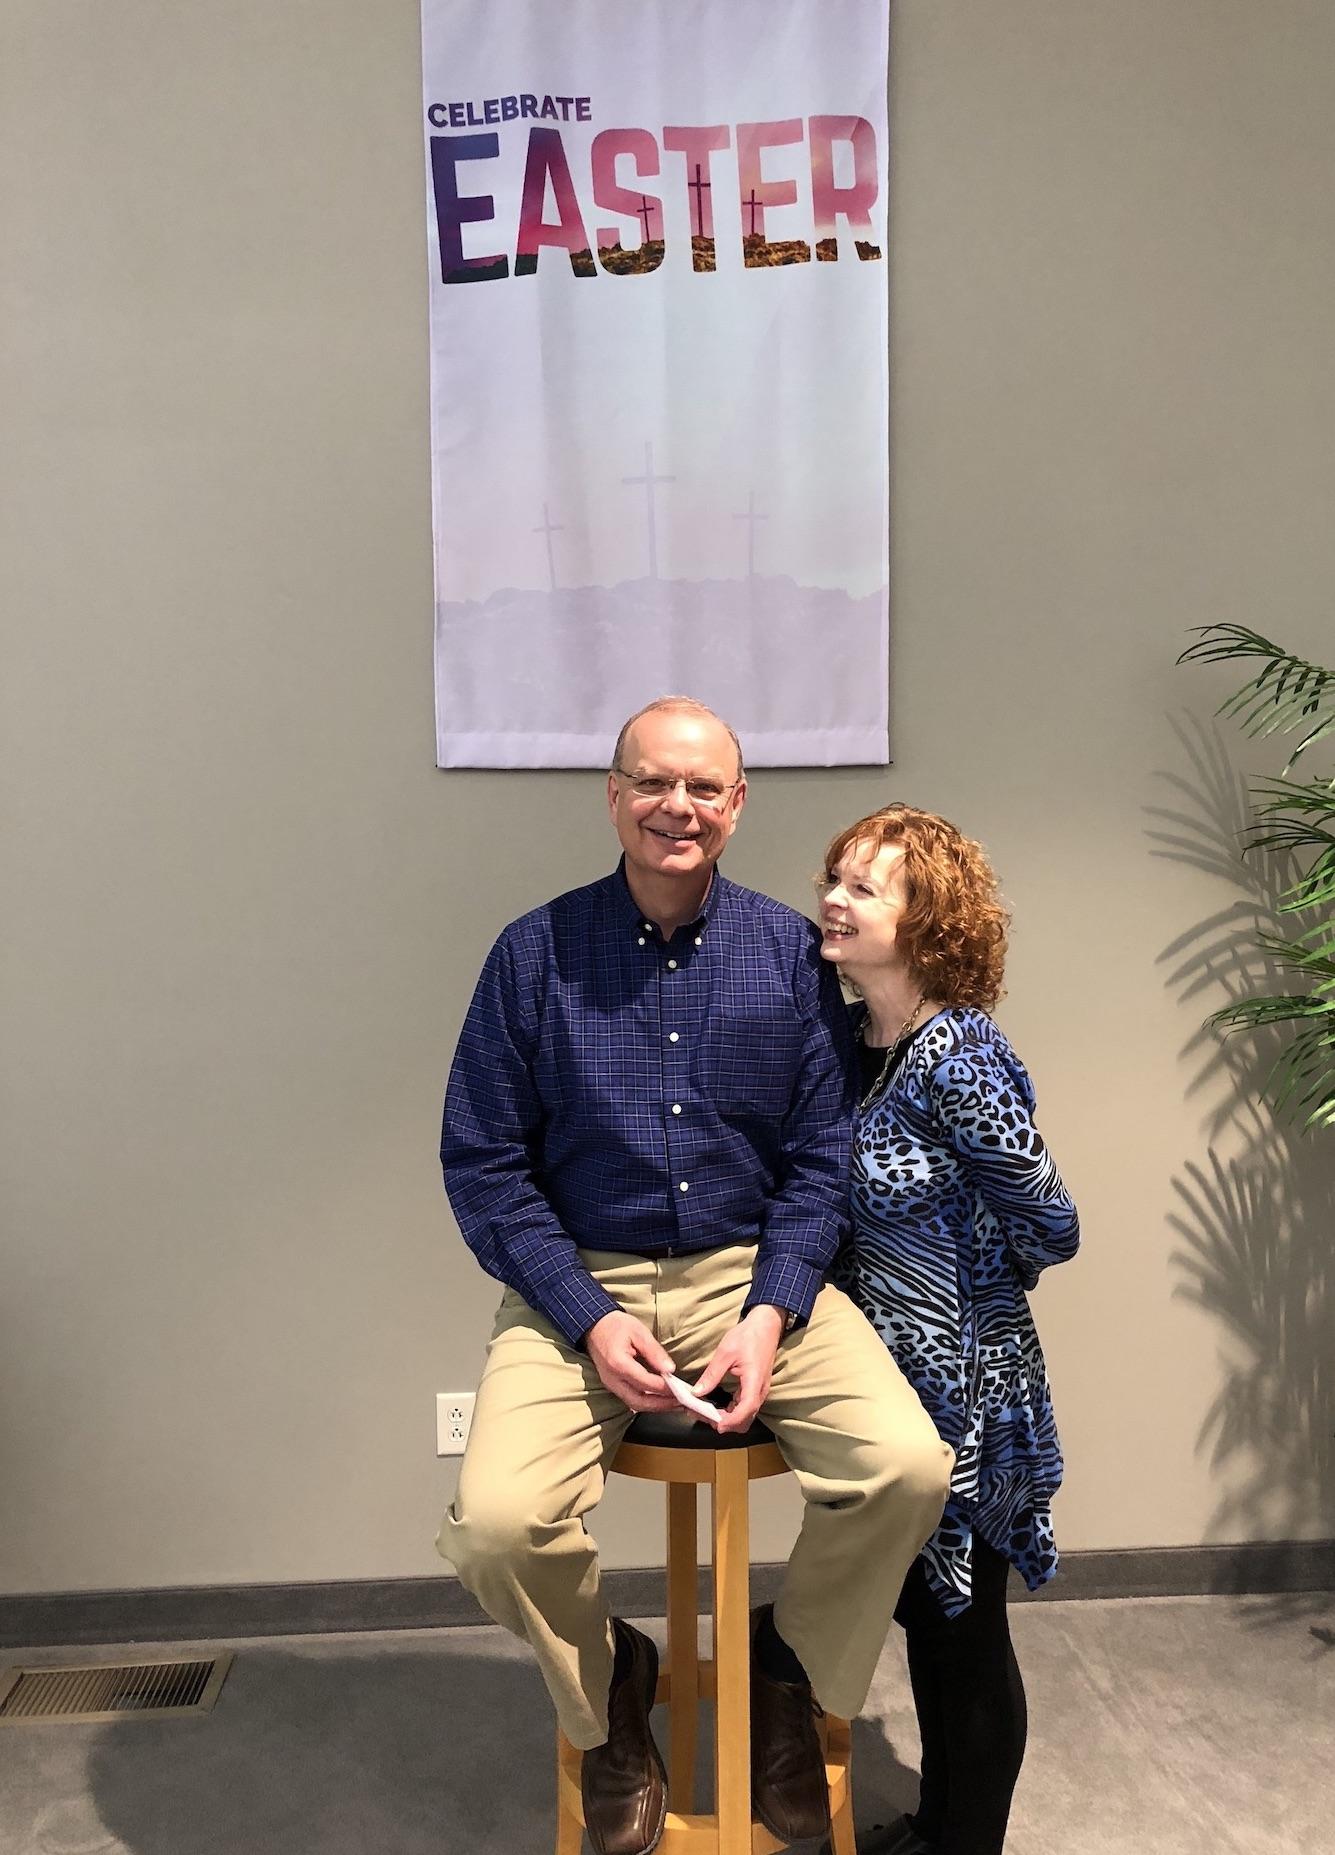 Steve & Rhonda Adamson